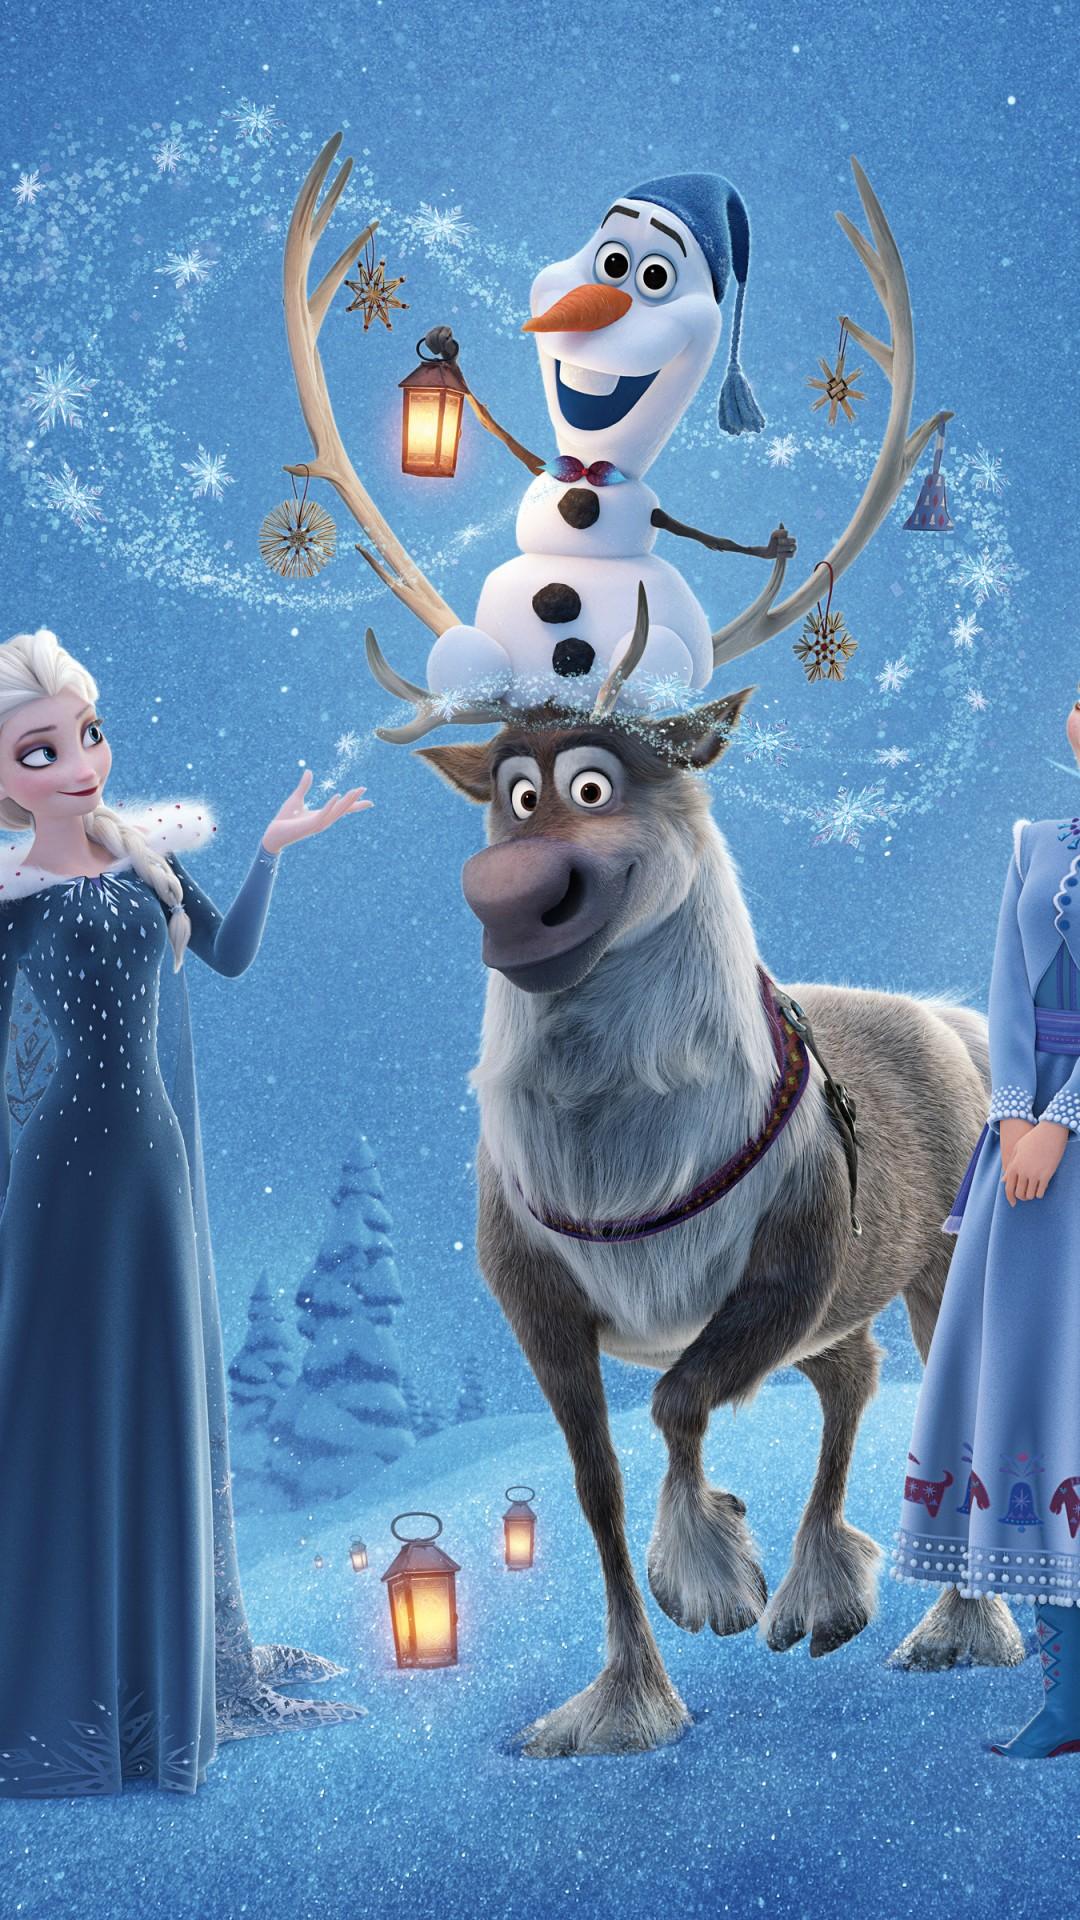 Wallpaper Olaf S Frozen Adventure Elsa Anna Winter